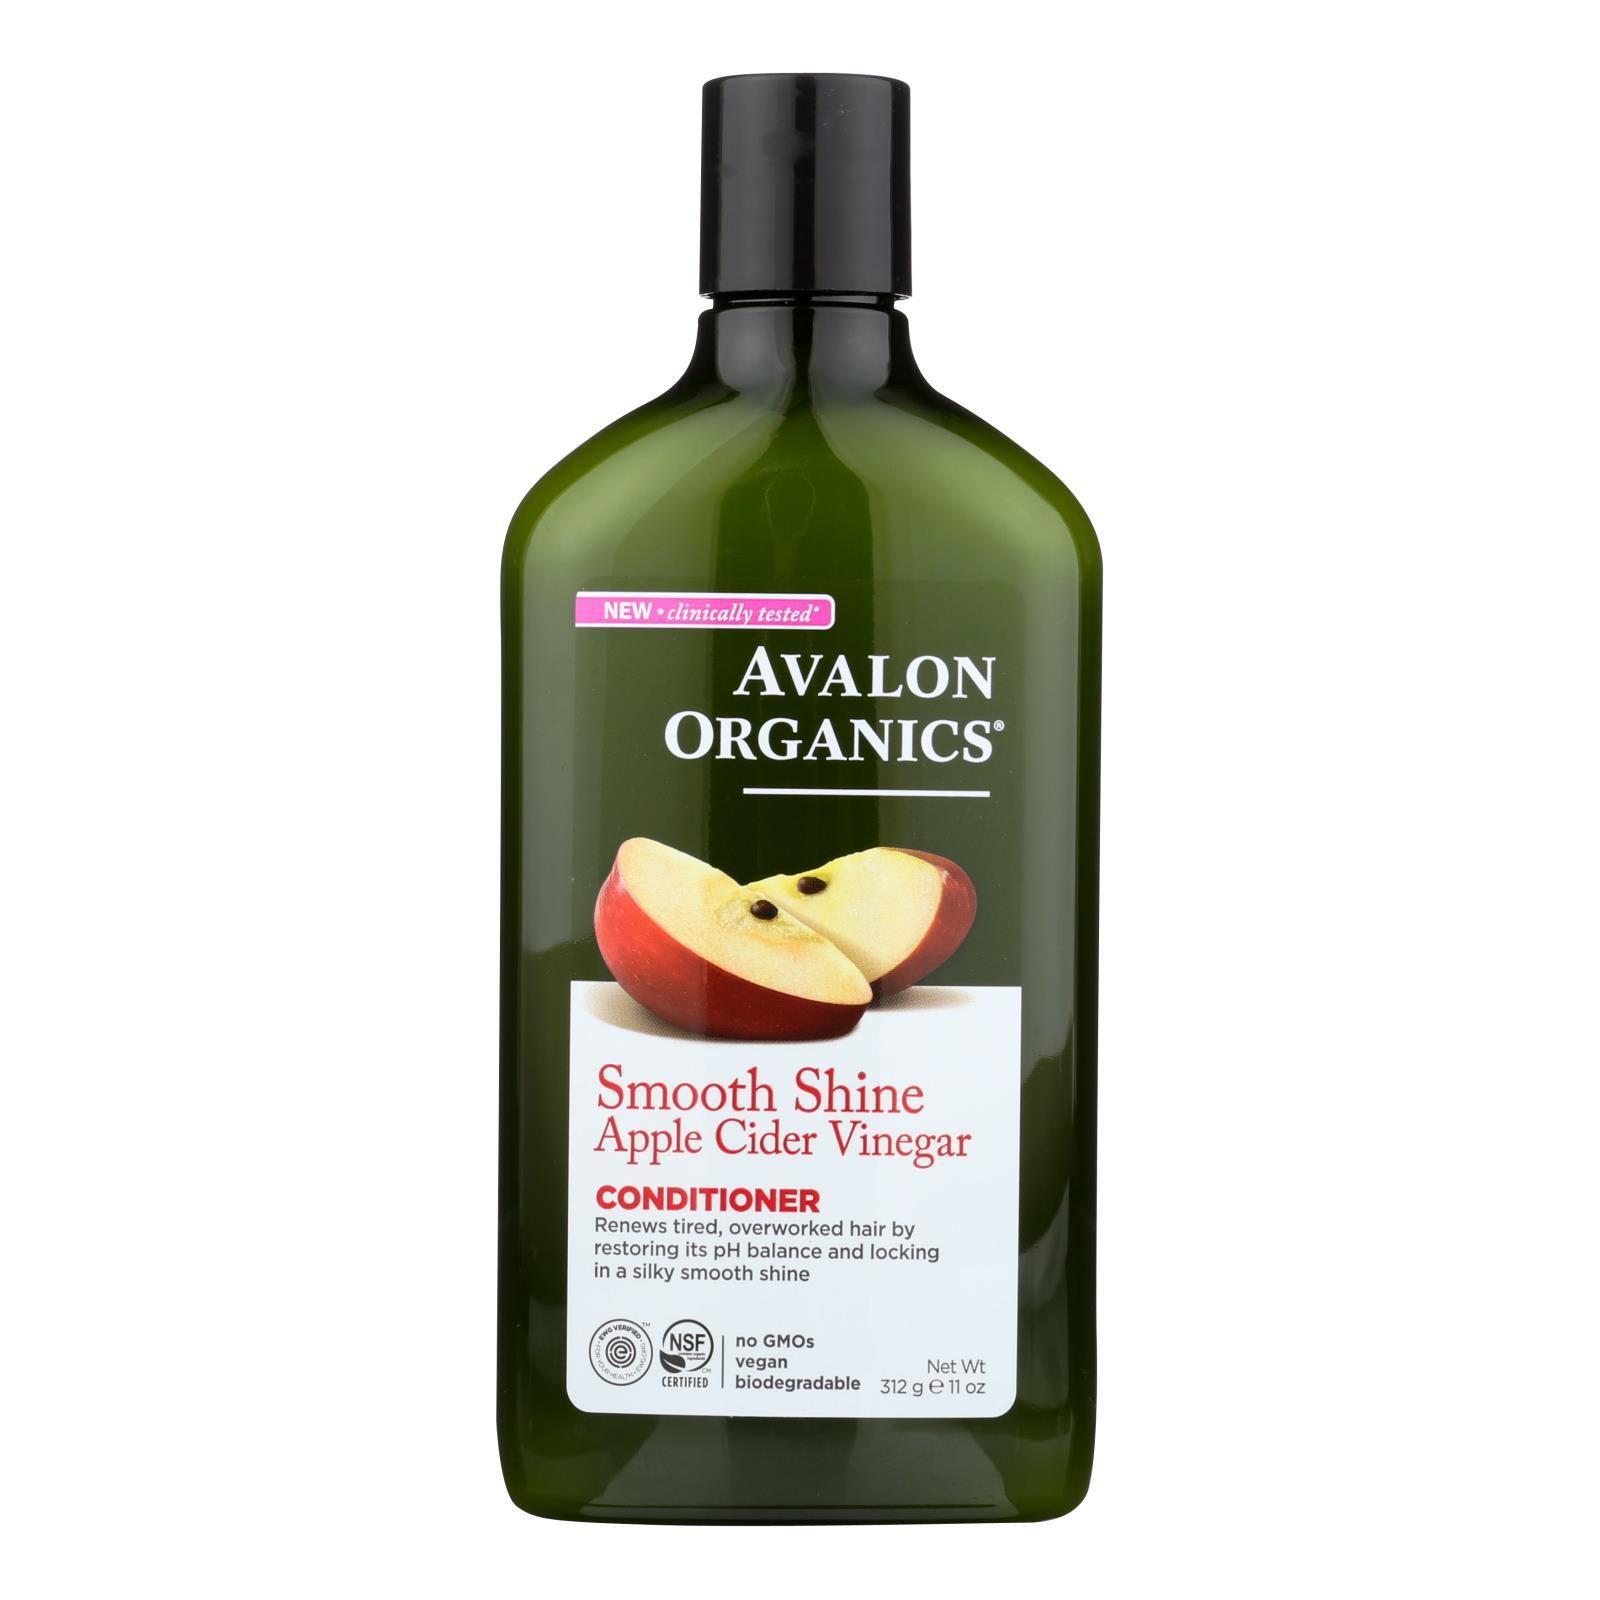 Smooth Shine Apple Cider Vinegar Conditioner